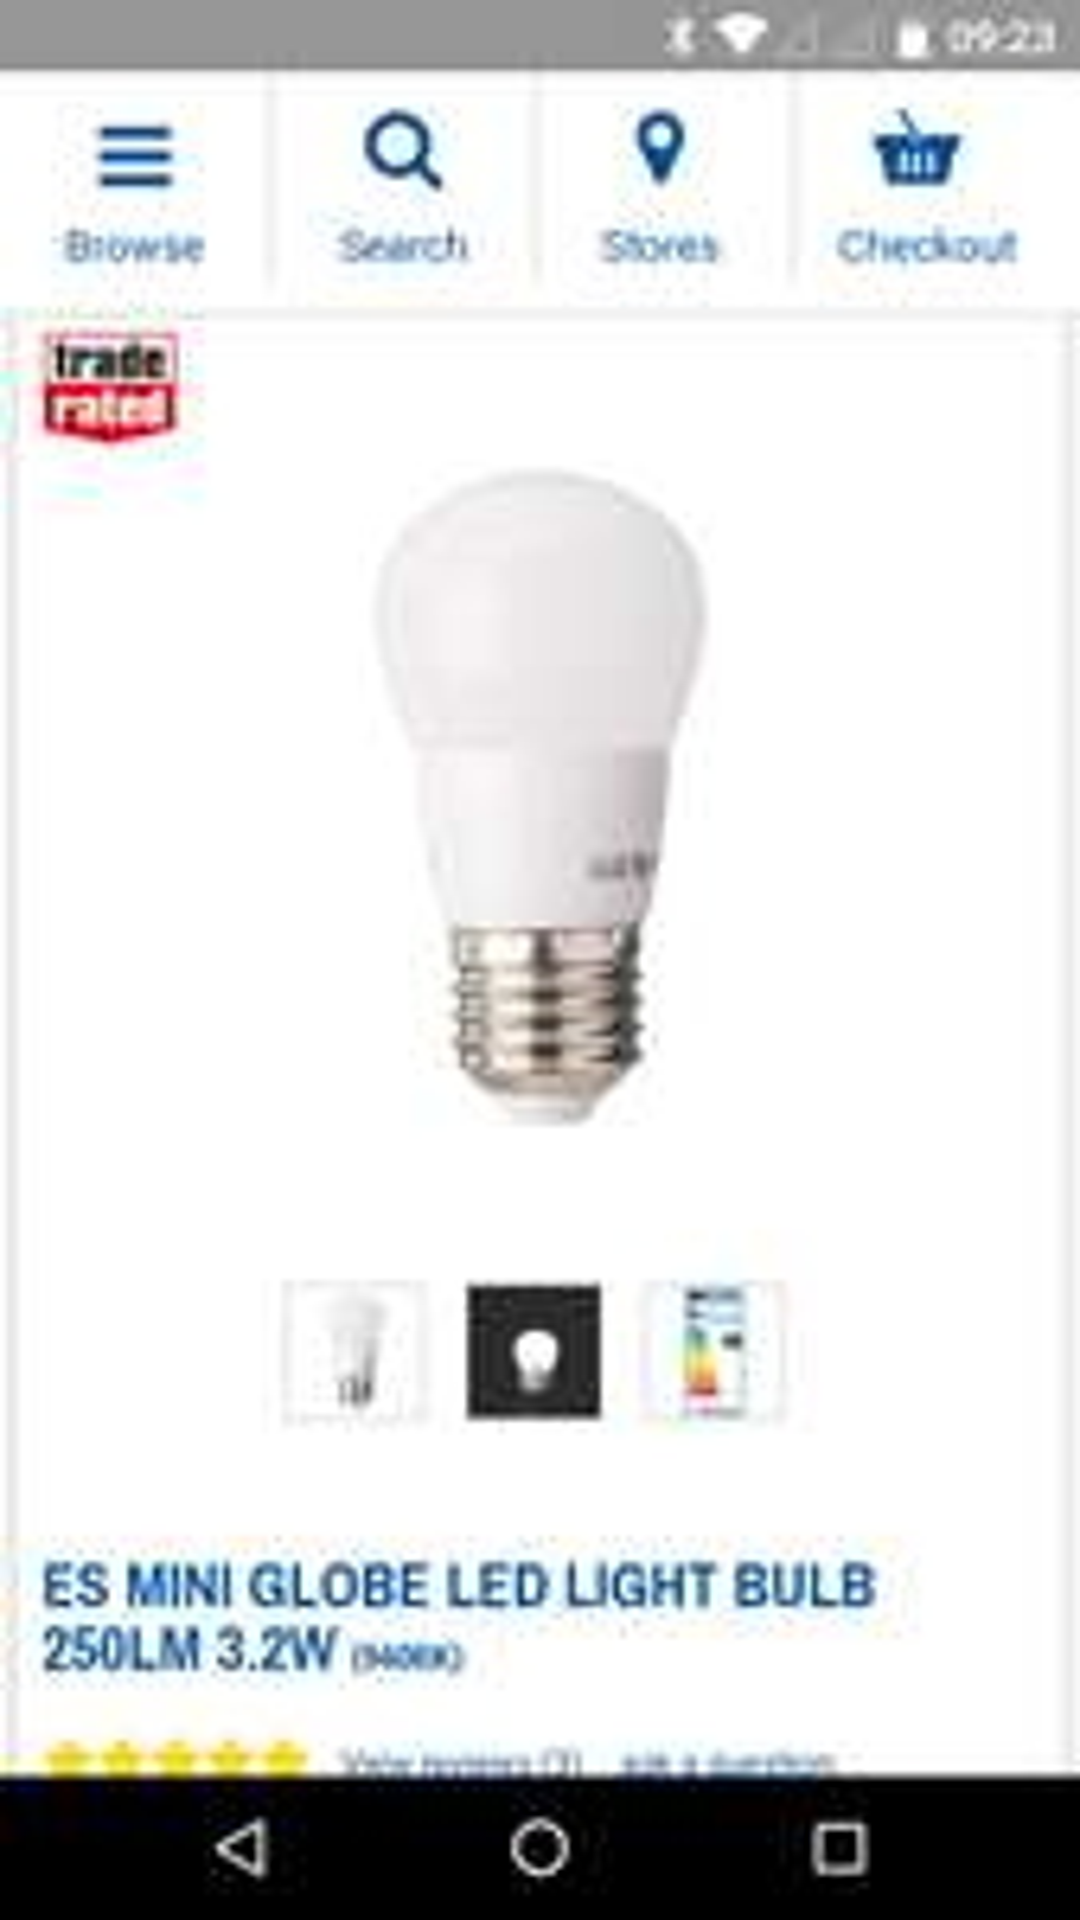 Power to the people, nice but dim, [insert light bulb joke here] Great Value Product  ES MINI GLOBE LED LIGHT BULB 250LM 3.2W - 49p @ Screwfix